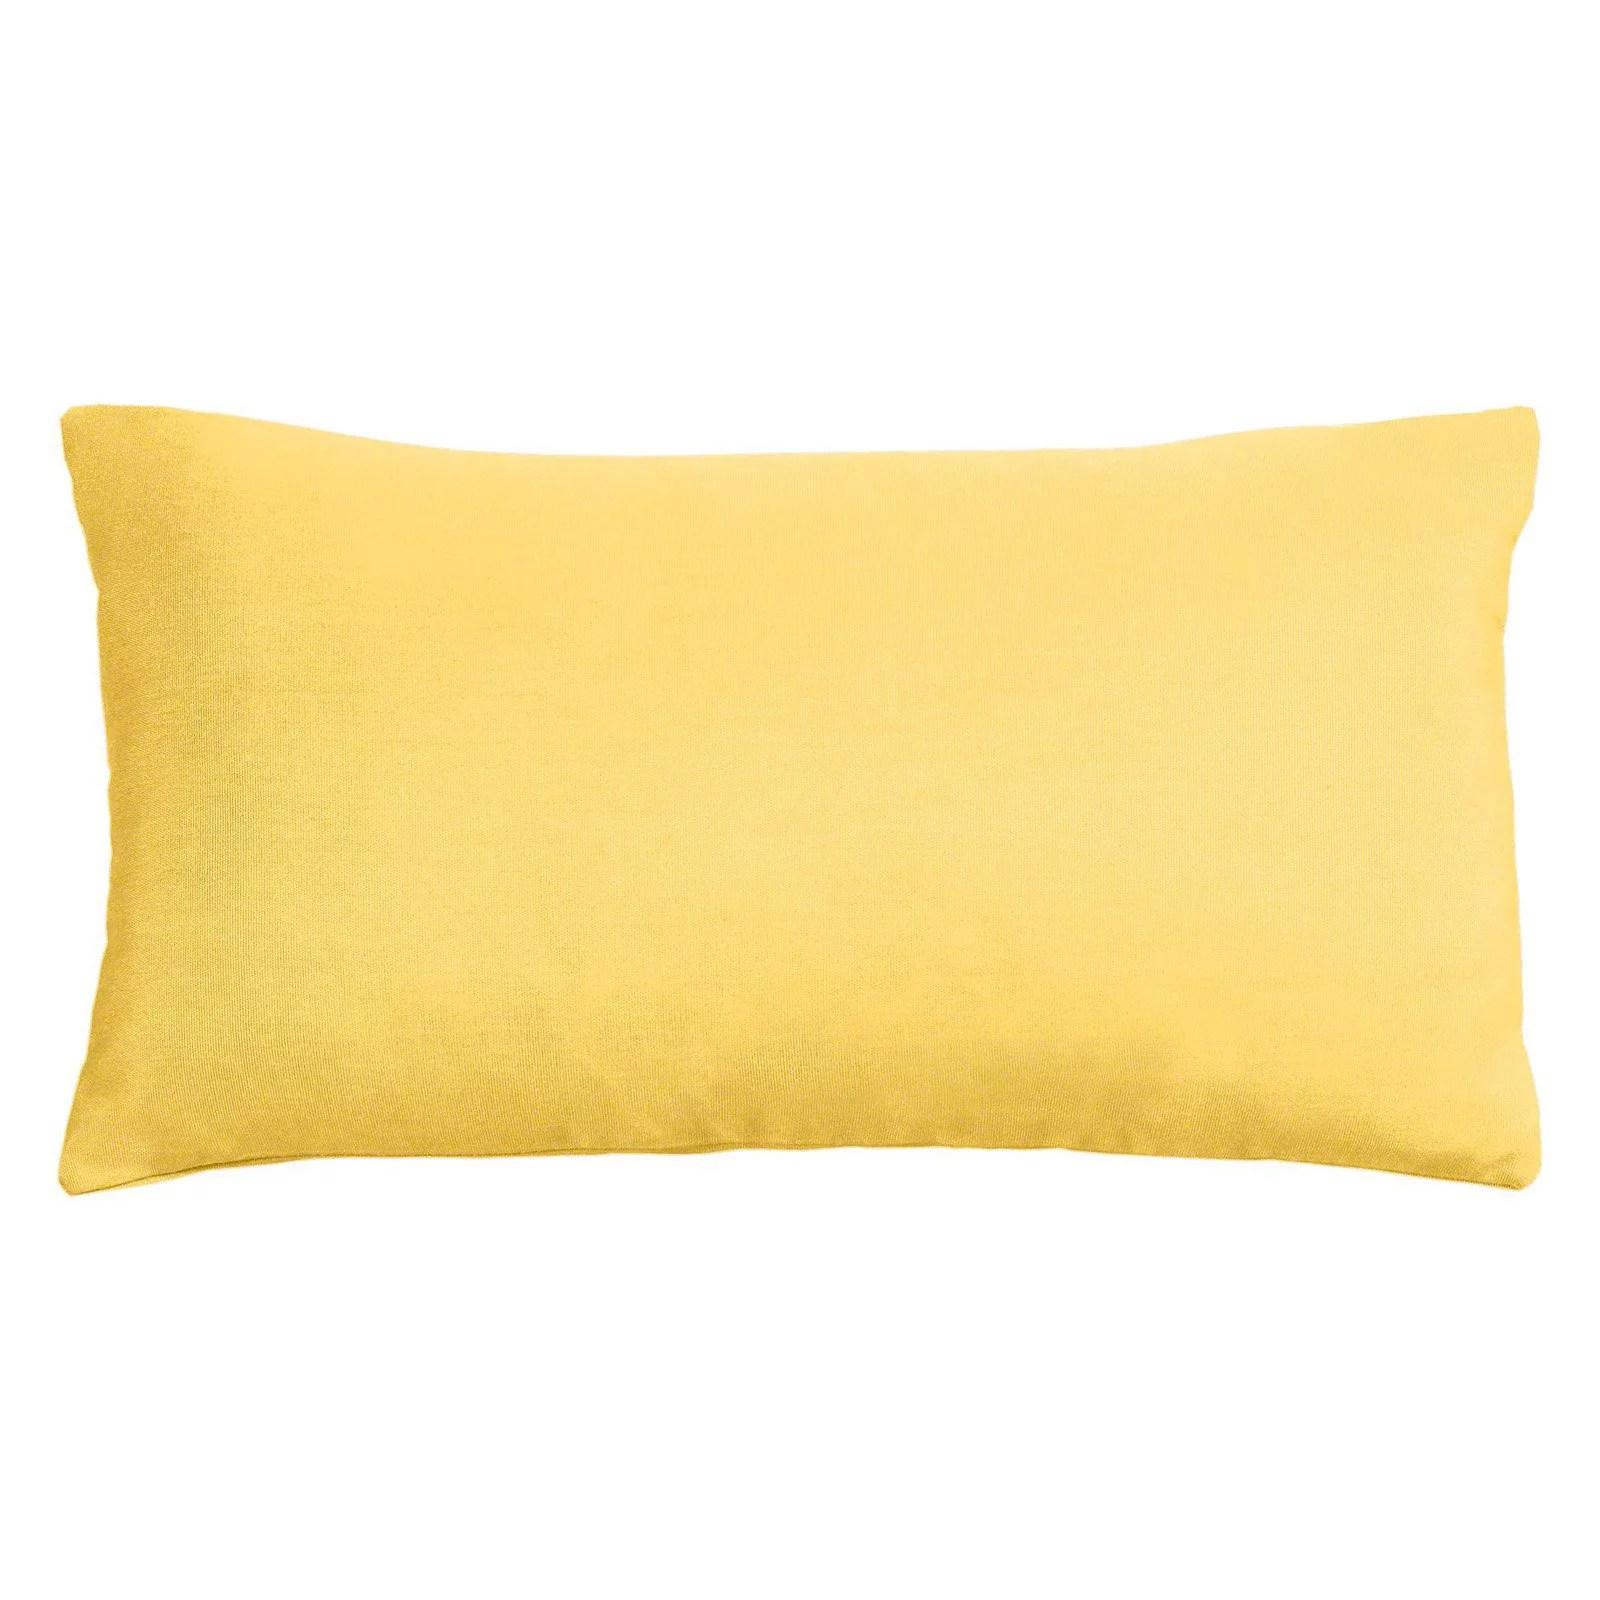 cushion source 20 x 12 in solid sunbrella indoor outdoor lumbar pillow